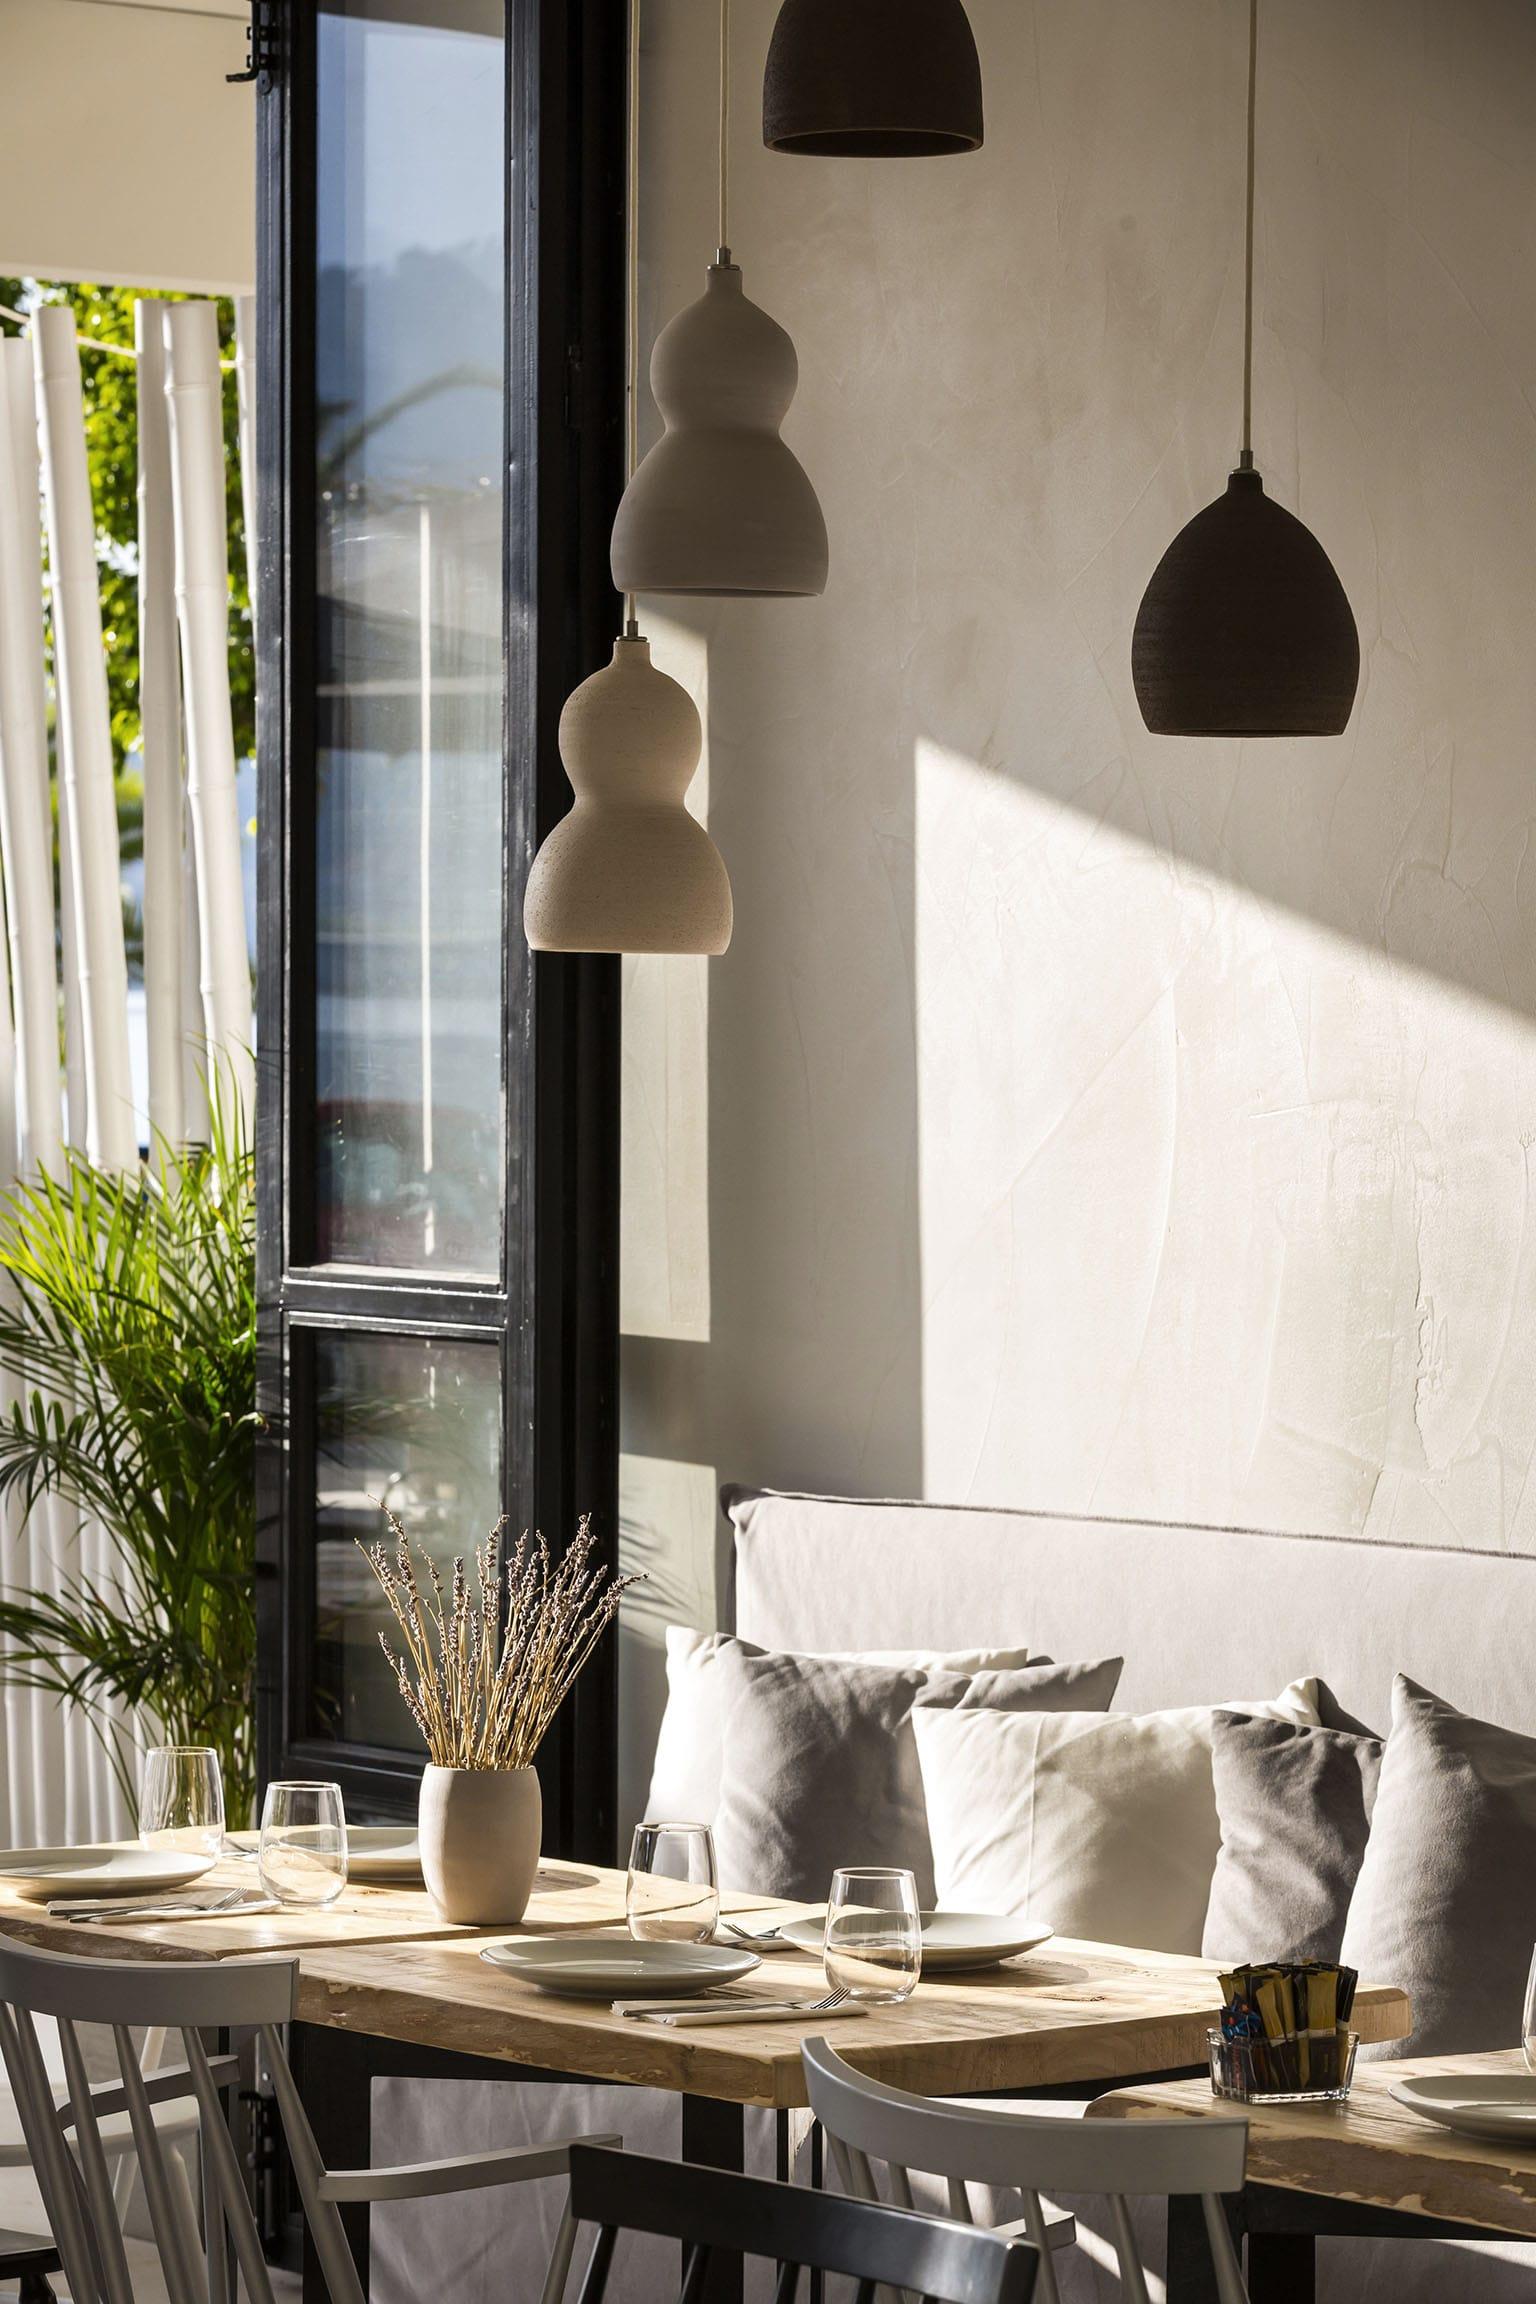 Best-Hotels-Kefalonia-Grand-boutique-2